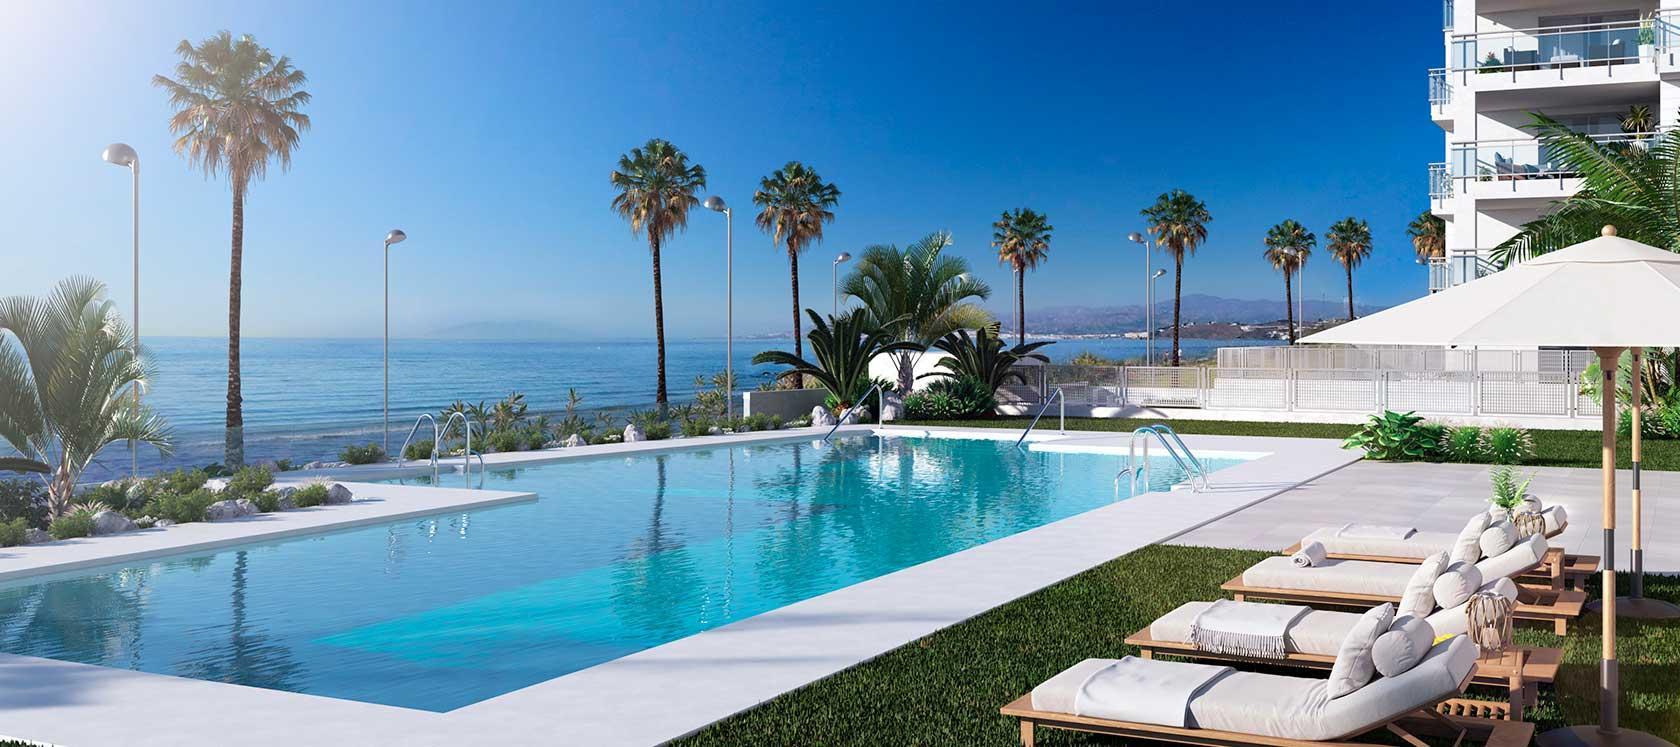 Obra nueva torrox costa - Málaga | Célere Duna Beach II exterior